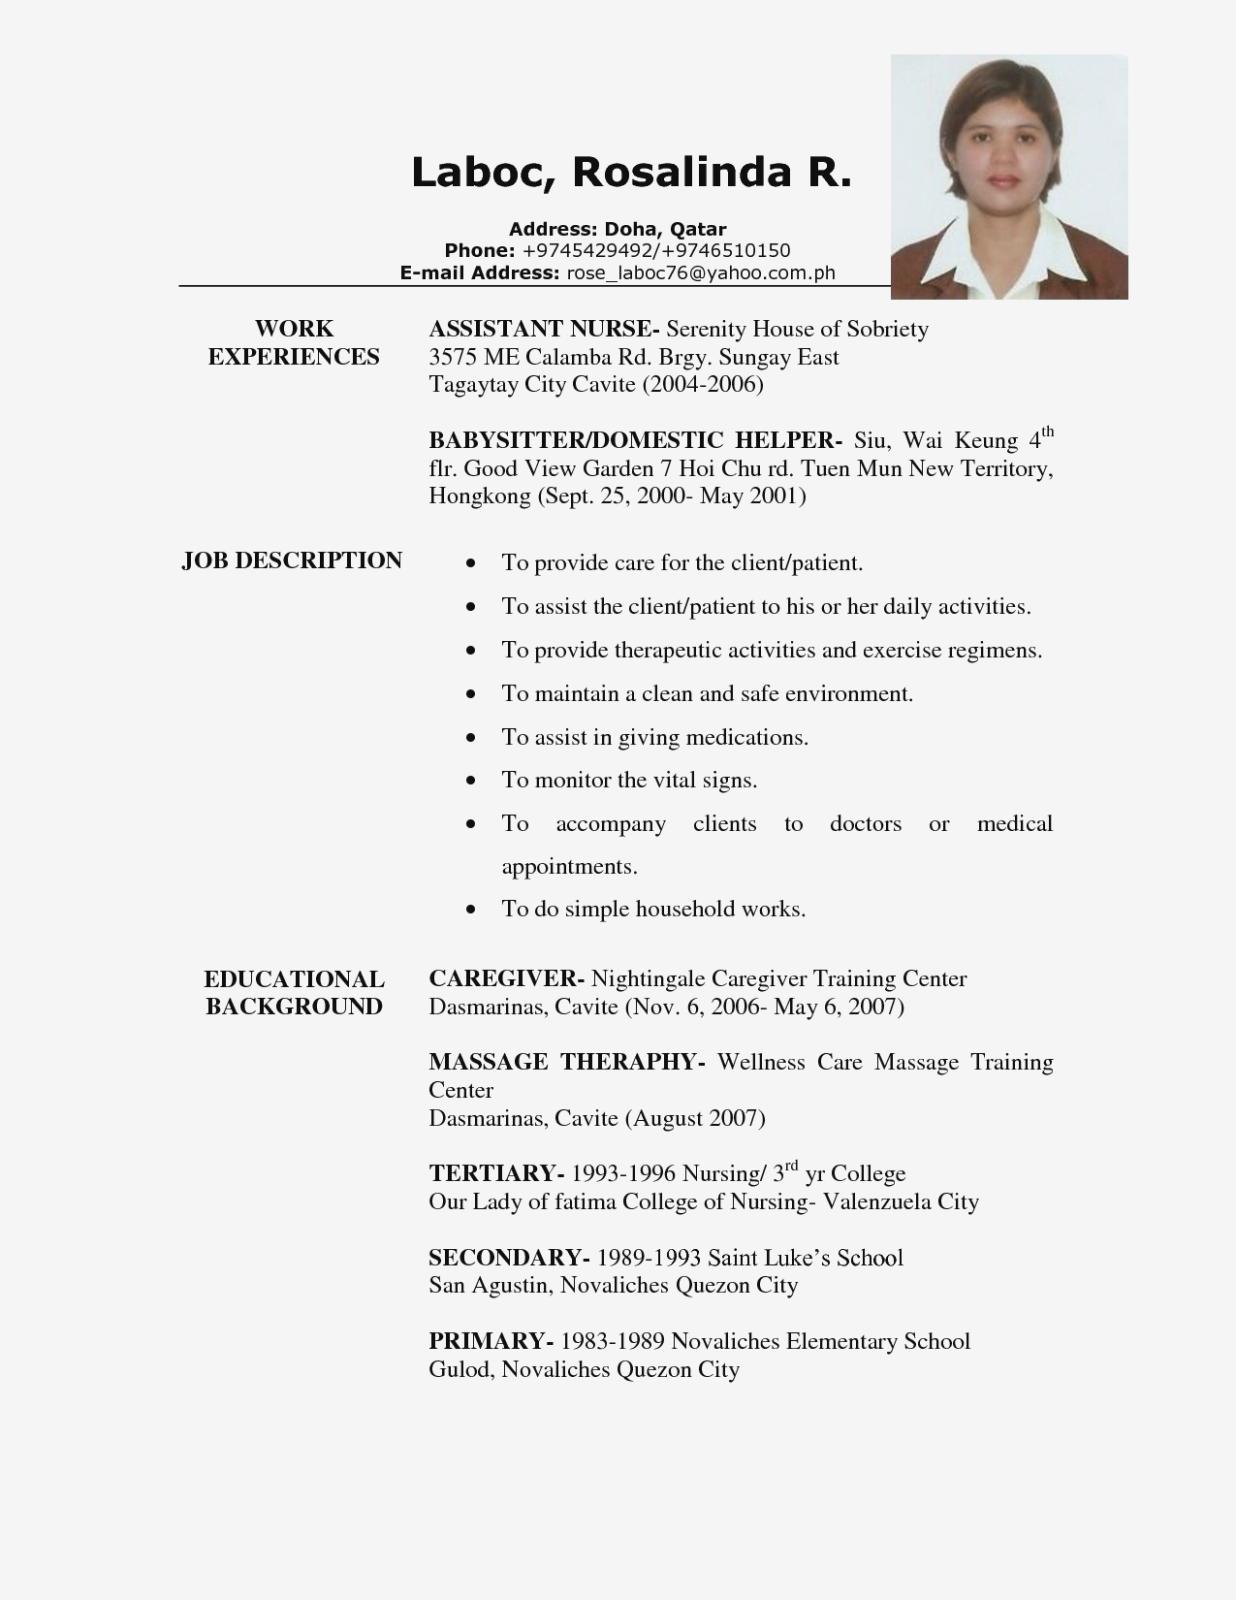 Caregiver Resume Samples Skills 2019 Caregiver Resume Examples 2020